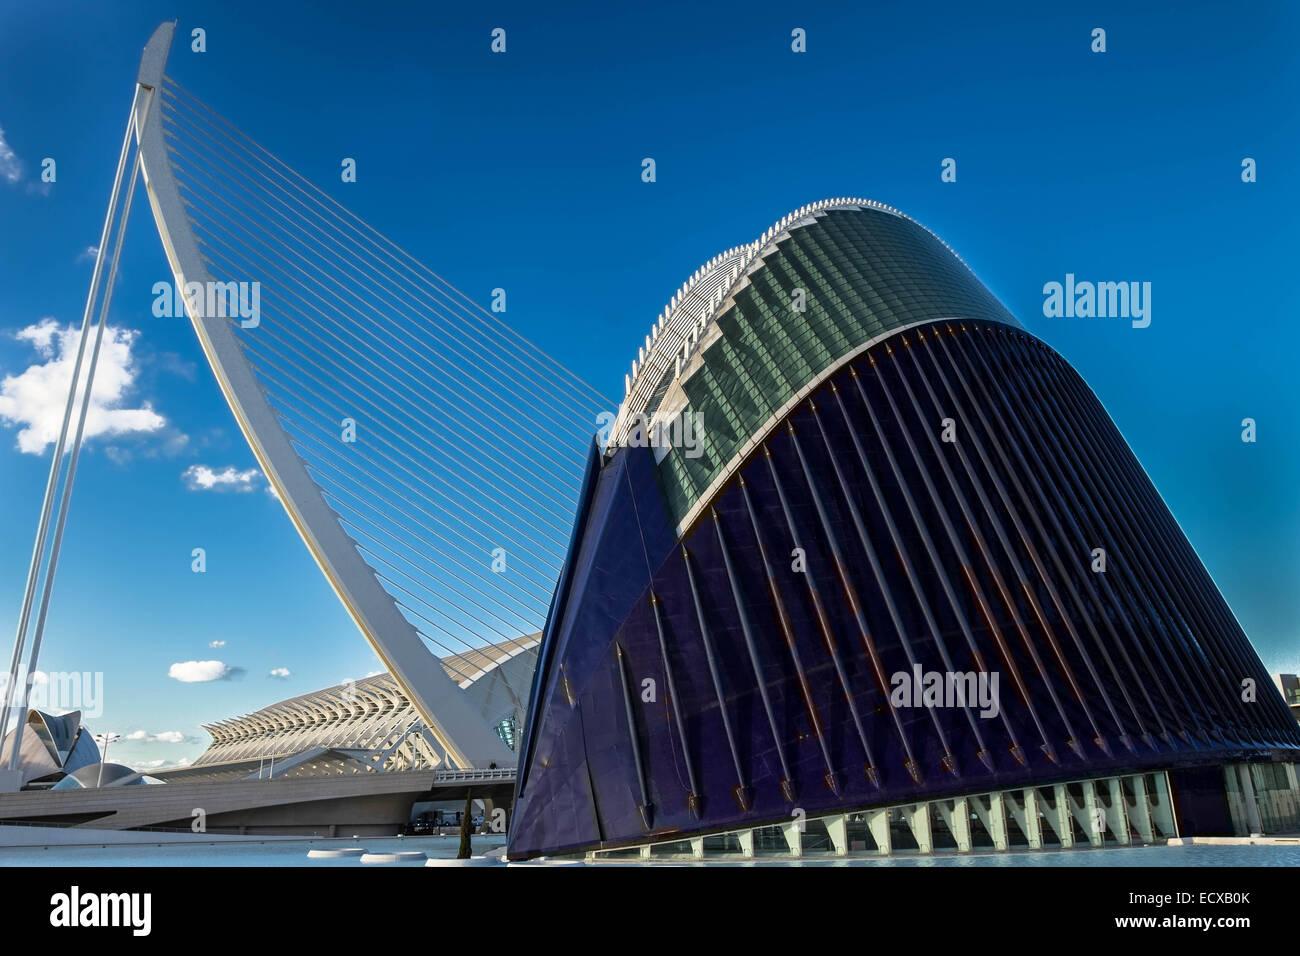 Modern futuristic building, Valencia, Spain - Stock Image